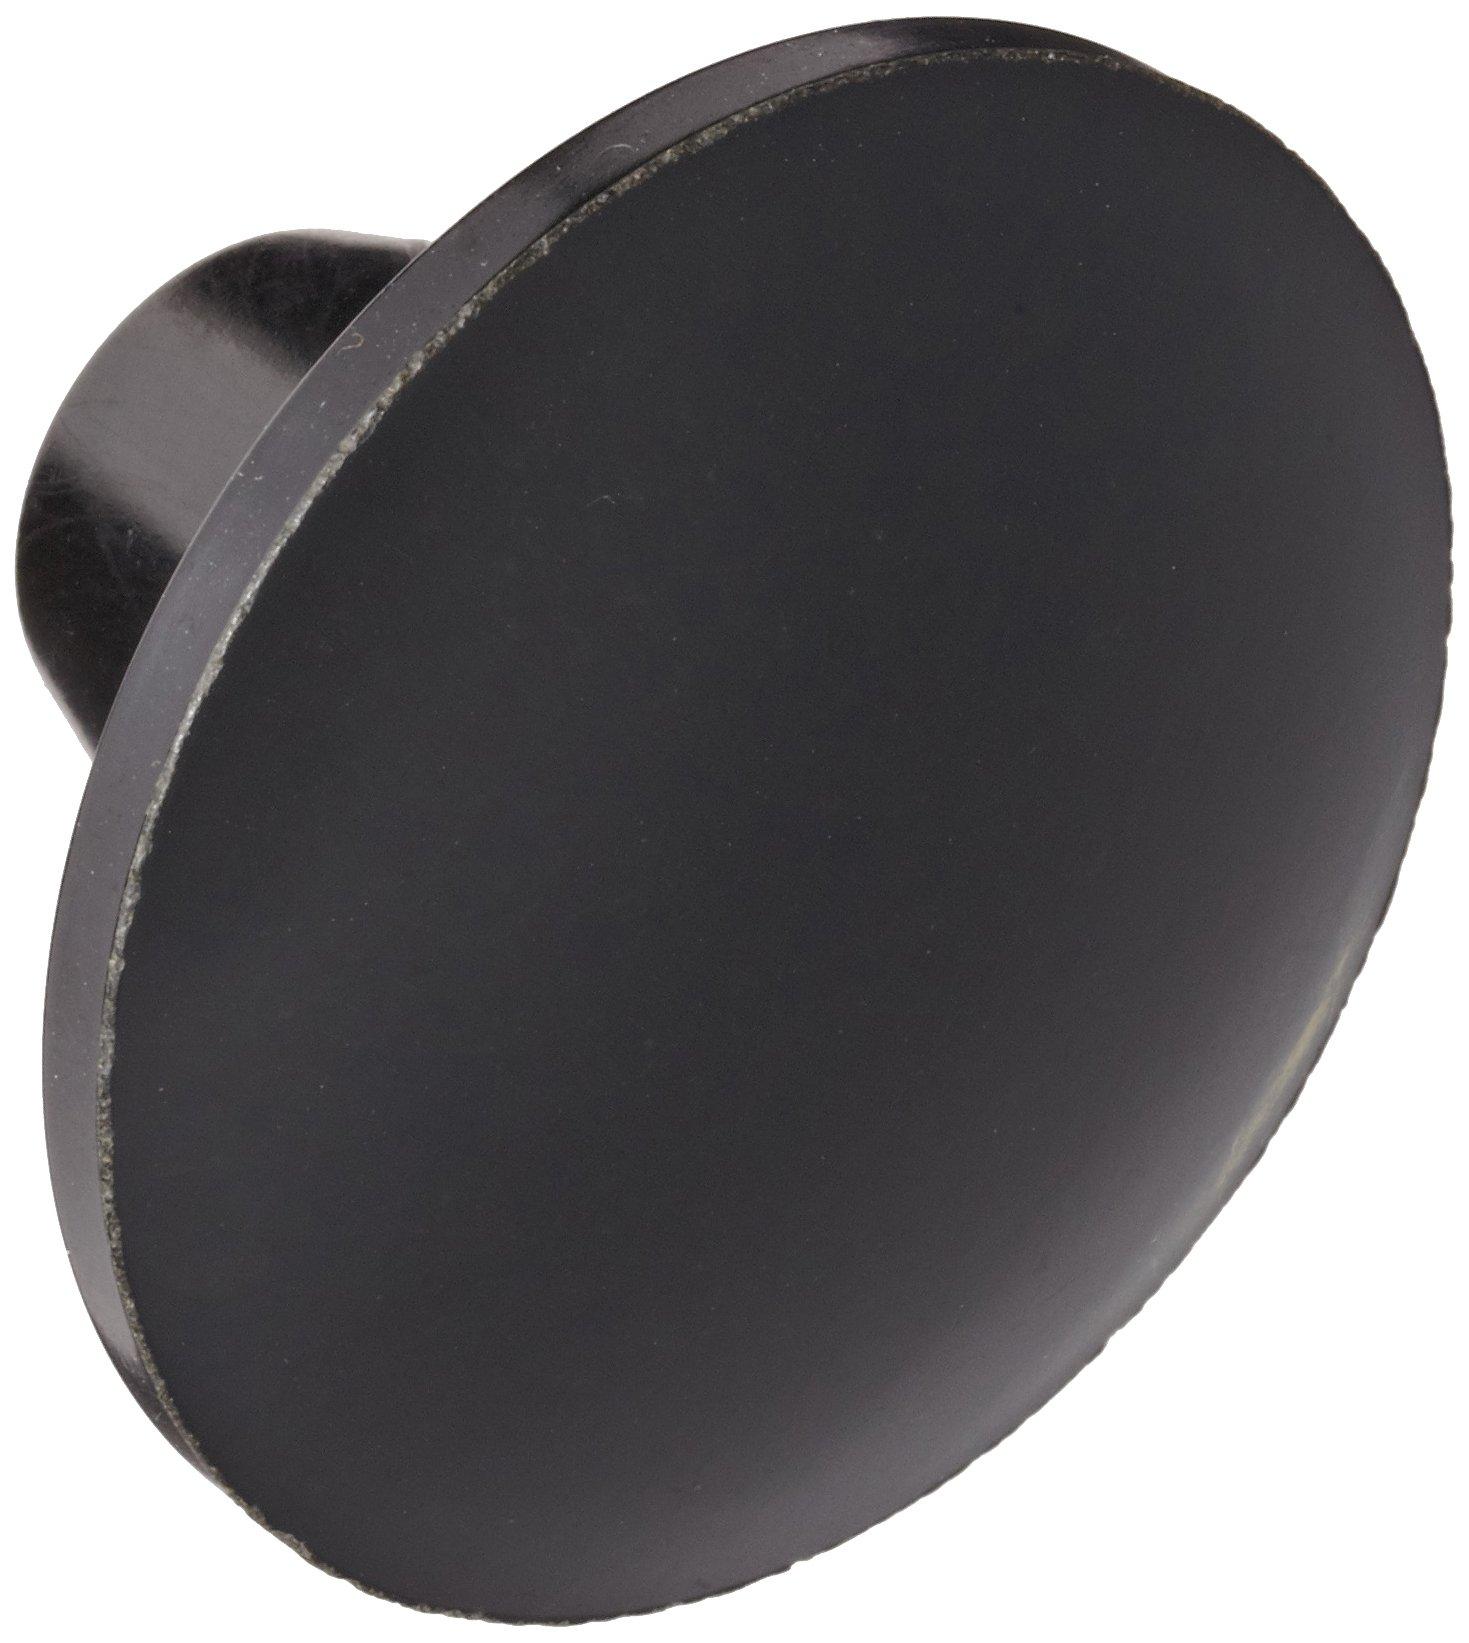 DimcoGray Black Phenolic Push-Pull Knob